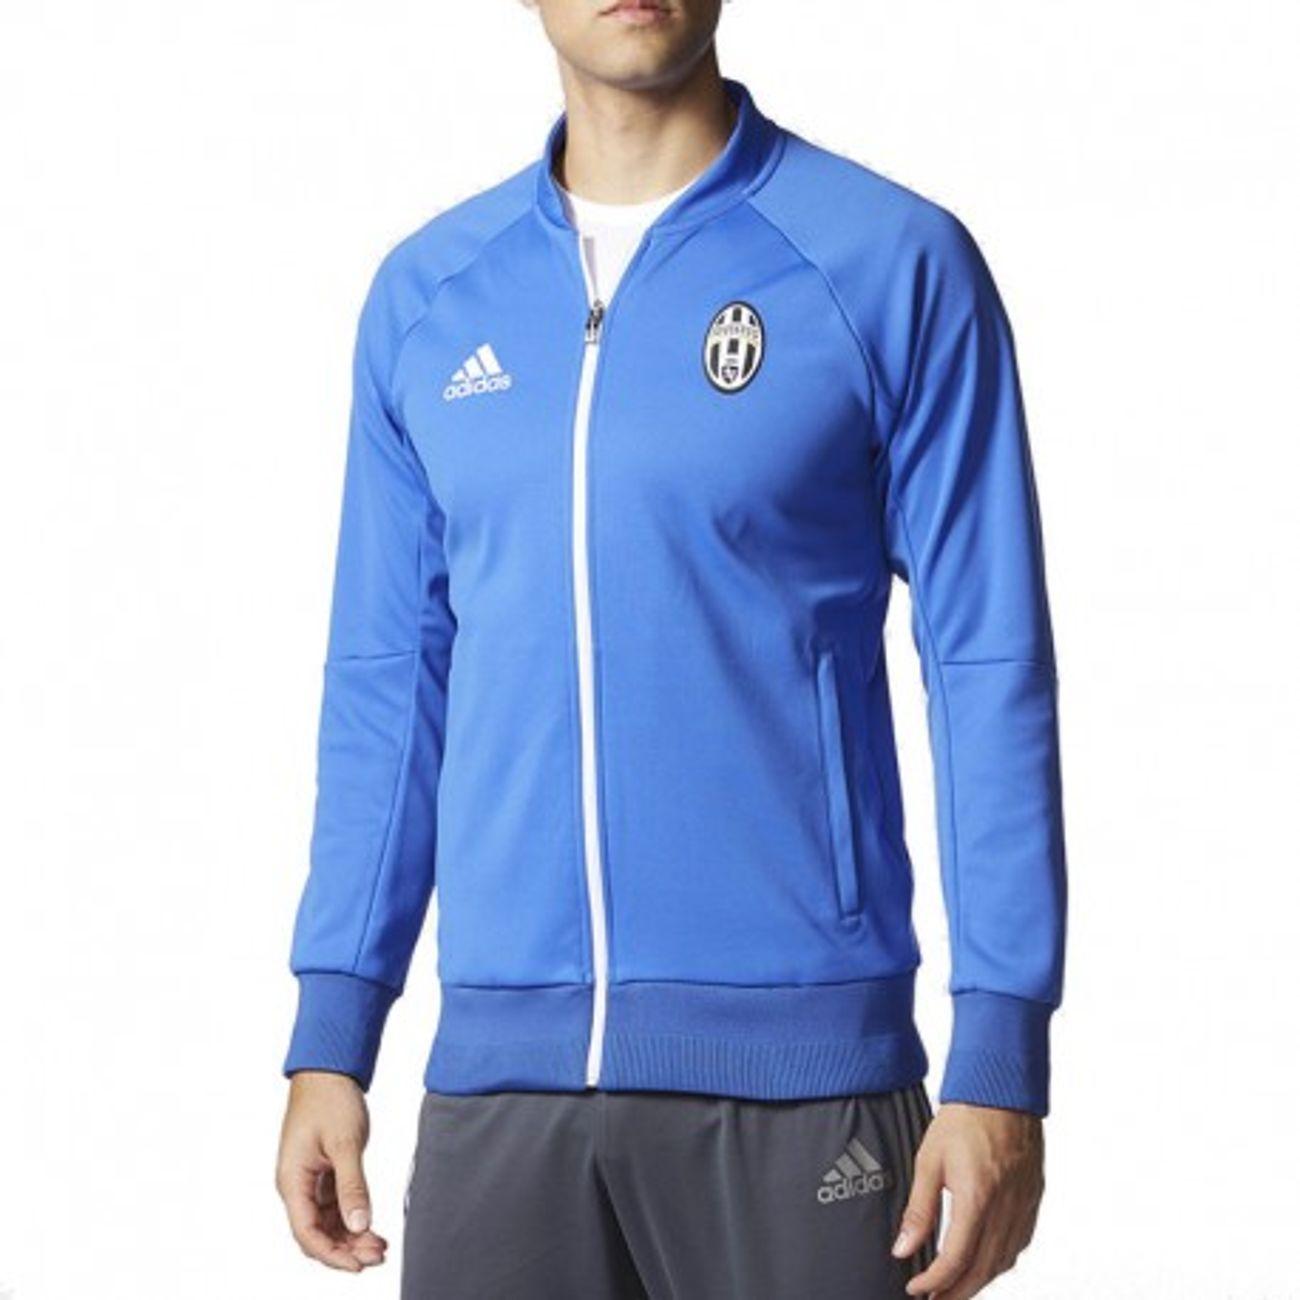 Football Et Achat Prix Turin Homme Veste Juventus – Adidas Bleu De qw1zxtRn8O